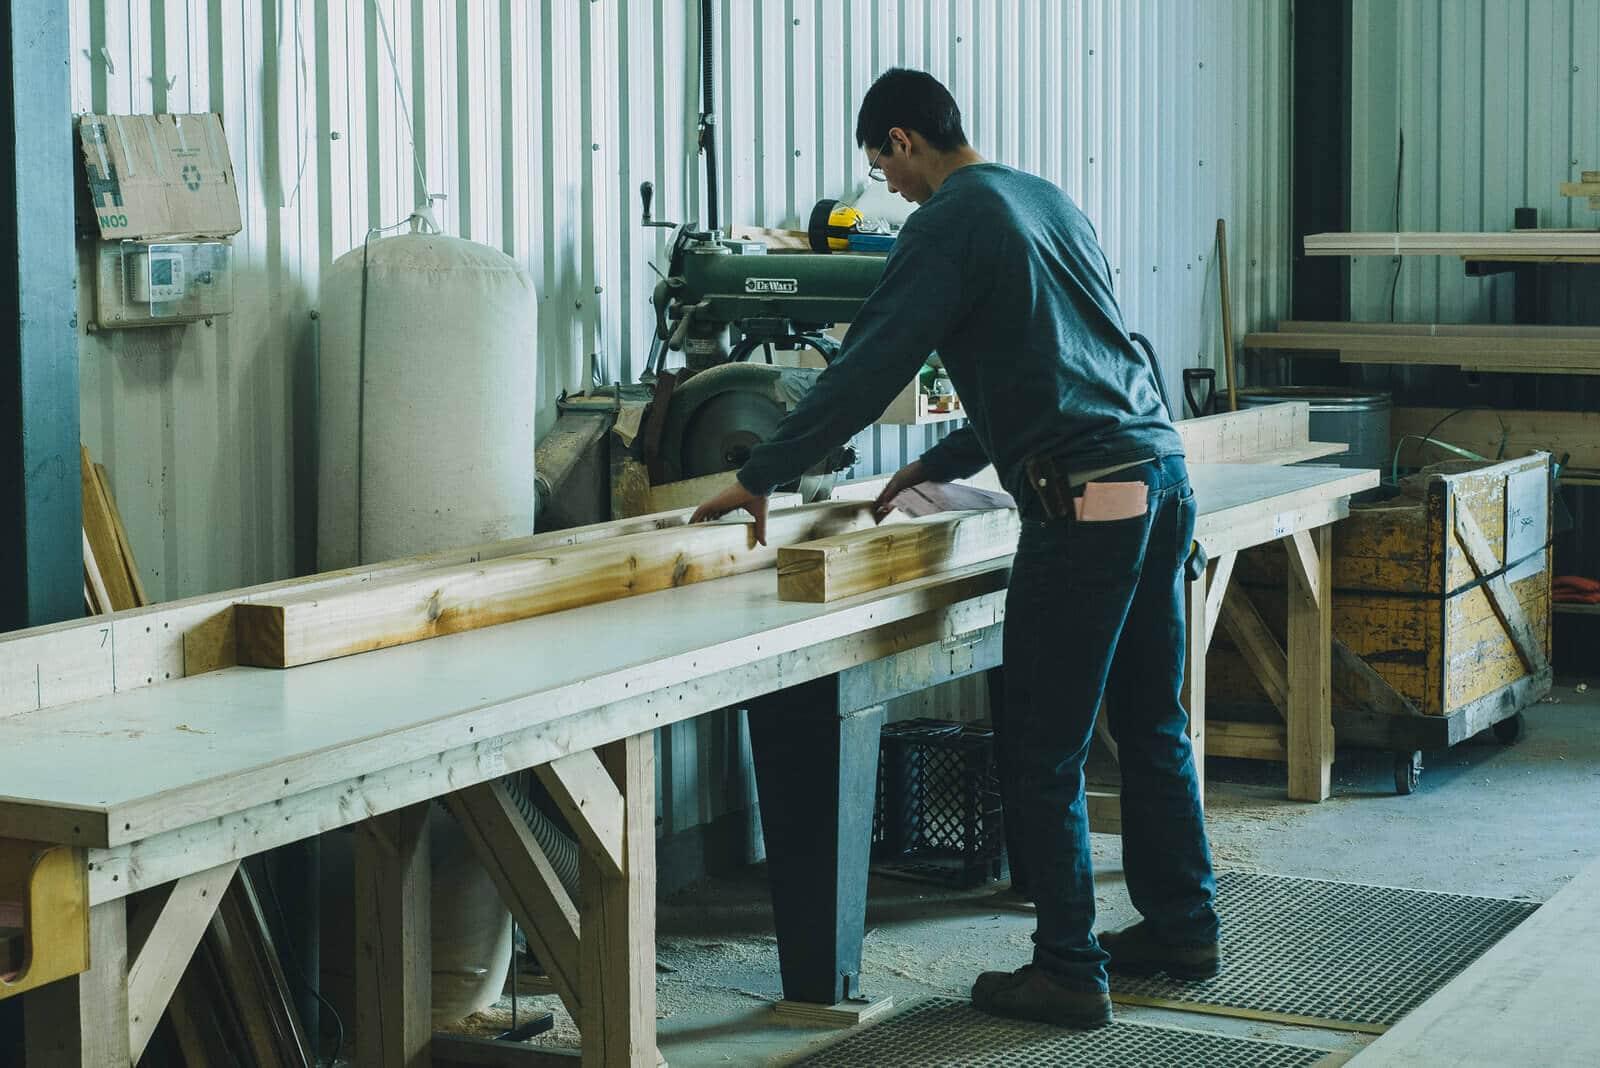 Staff cutting some wood.